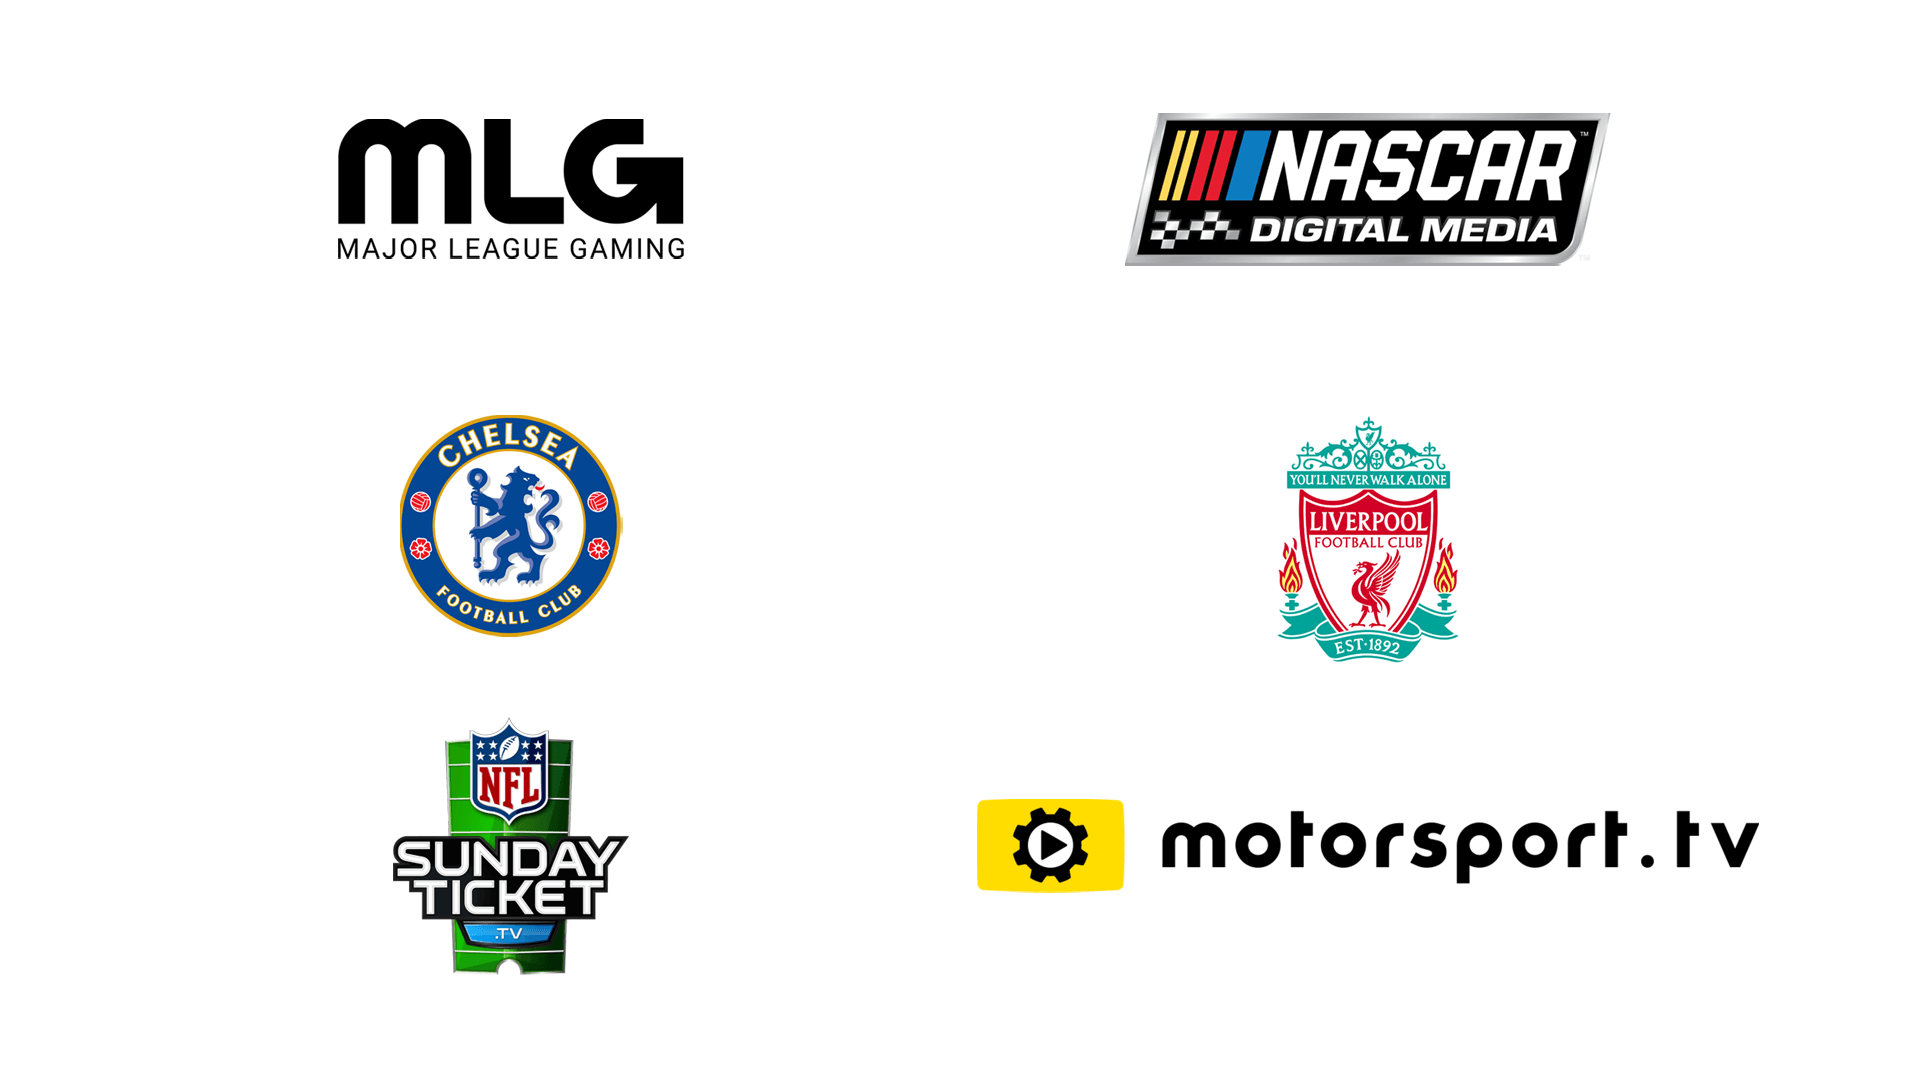 Sports and eSports Clients - MLG, NASCAR digital media, Chelsea, Liverpool football club, NFL Sunday Ticket, Motorsport TV